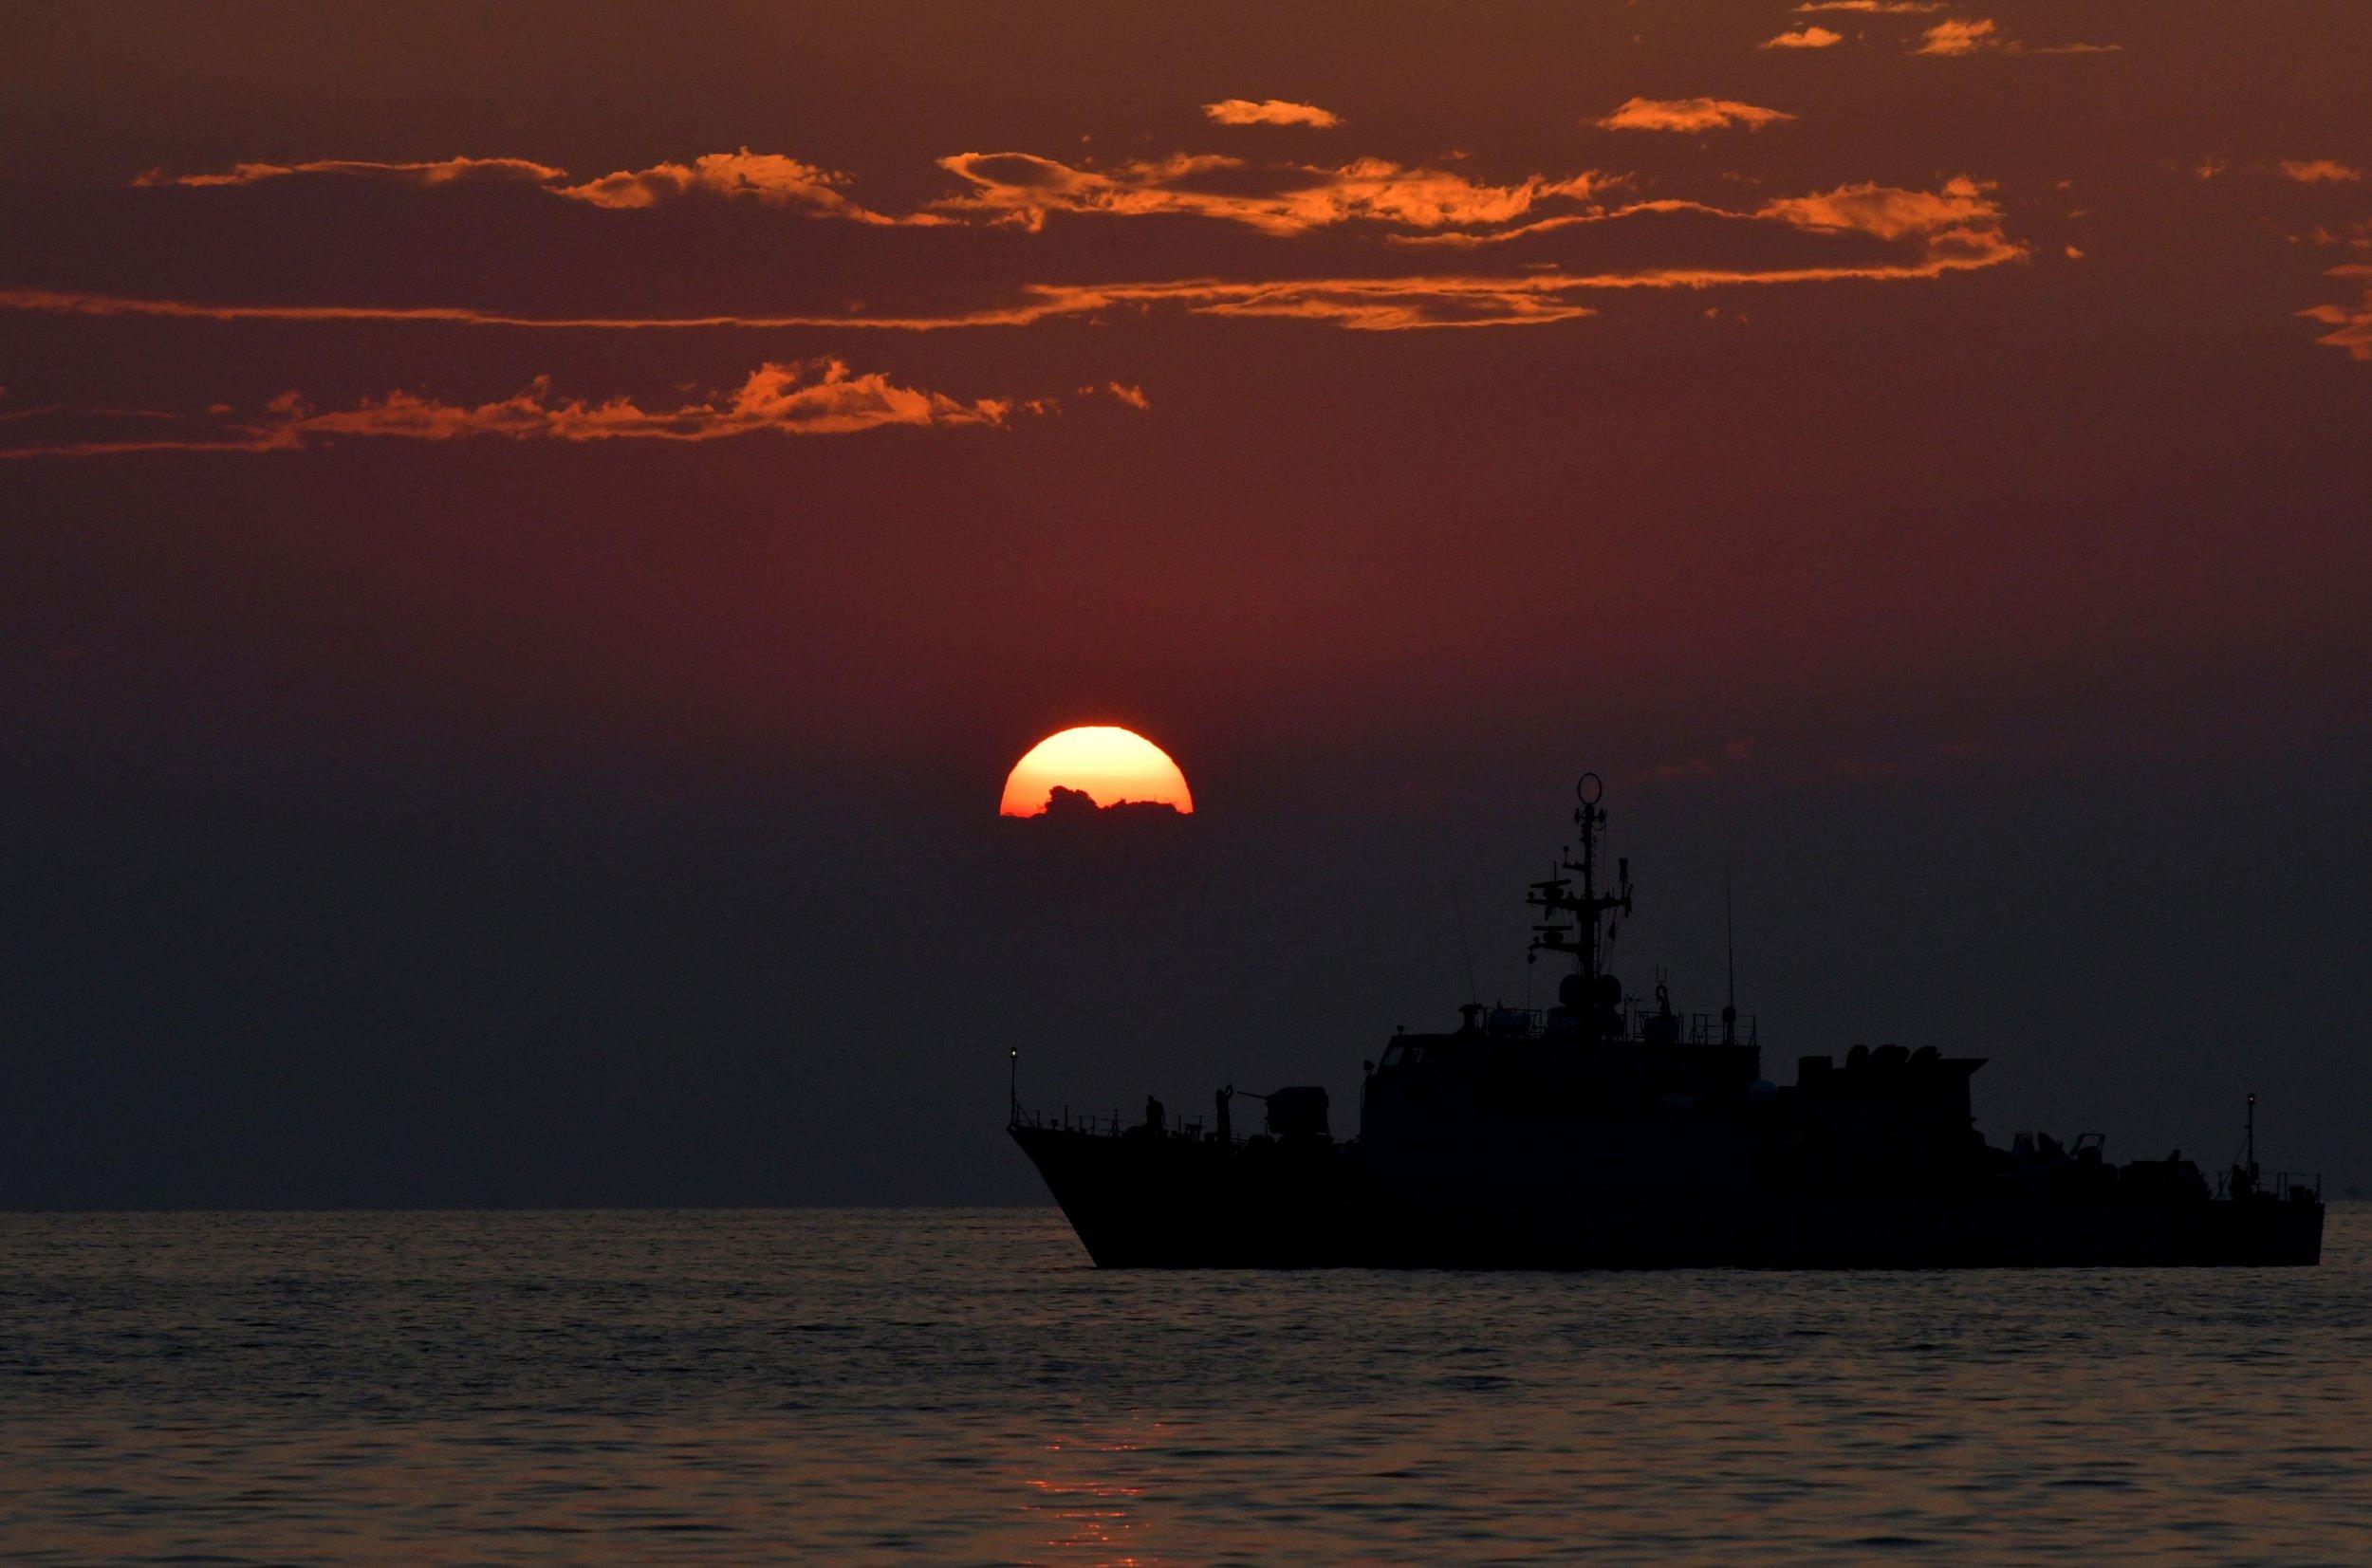 Italian vessel in the Mediterranean